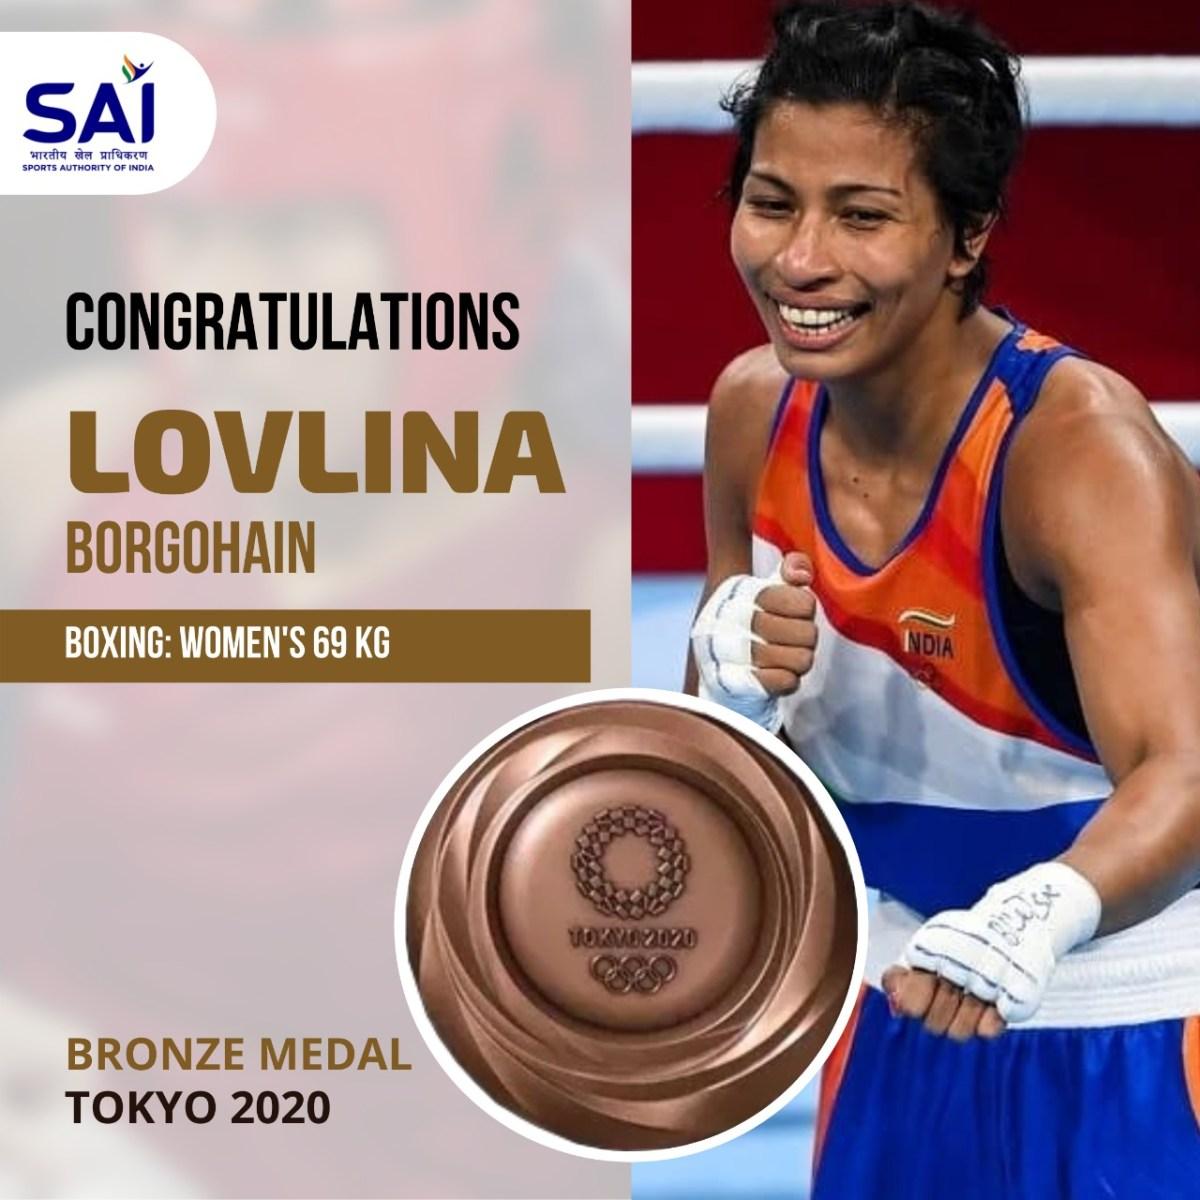 Lovlina Borgohain loses semi-finals, wins Bronze